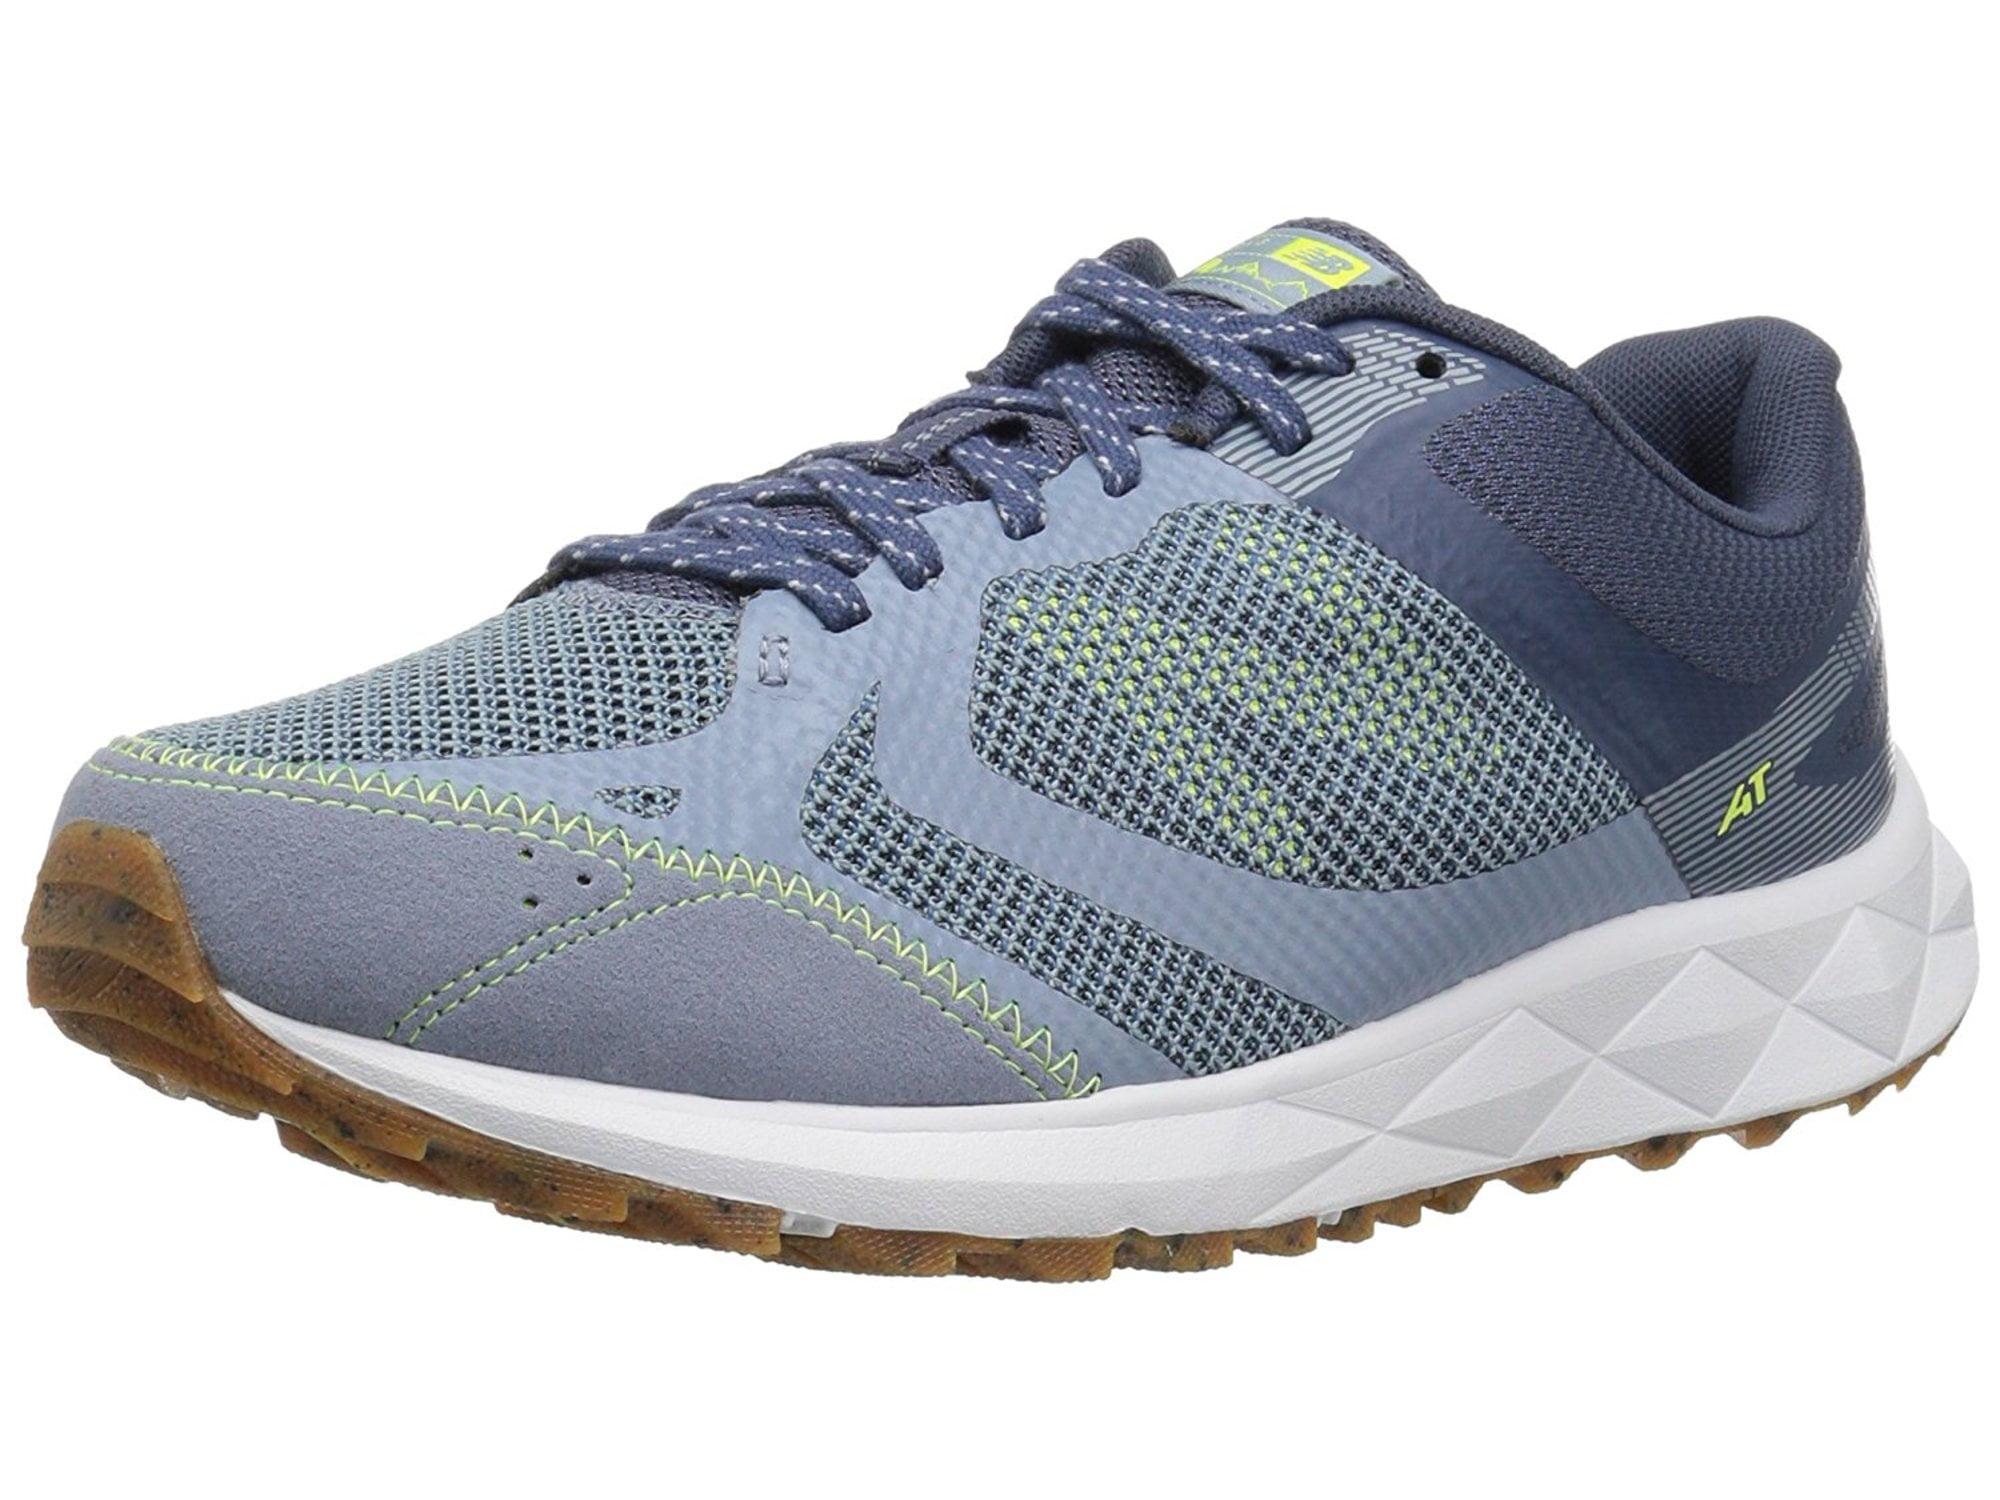 New Balance Women's 590v3 Running Shoe